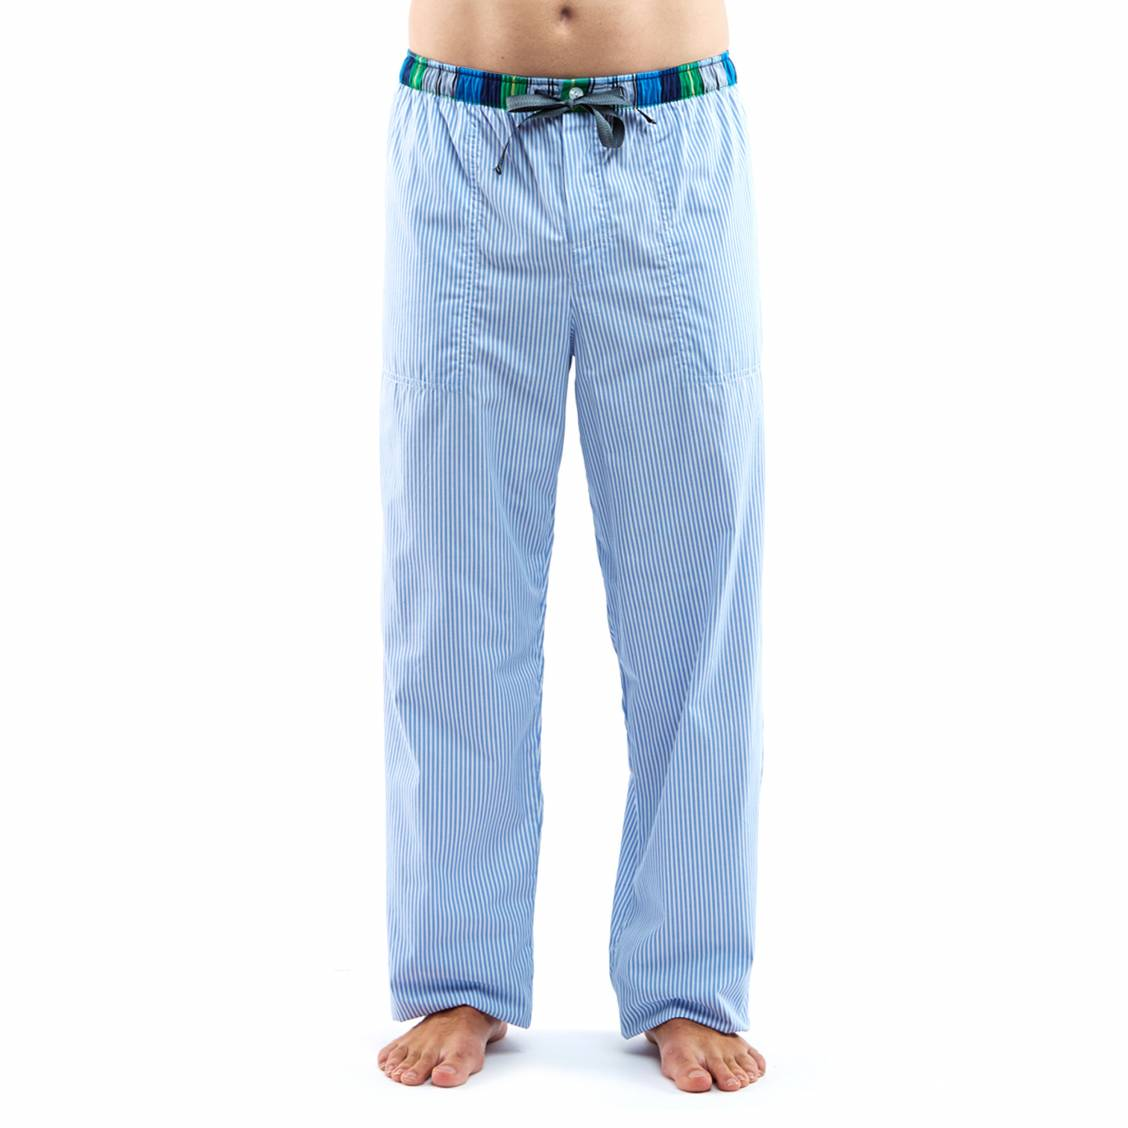 Pyjama Homme Chaud Of Pyjama Homme Wmag Modes Et Tendances